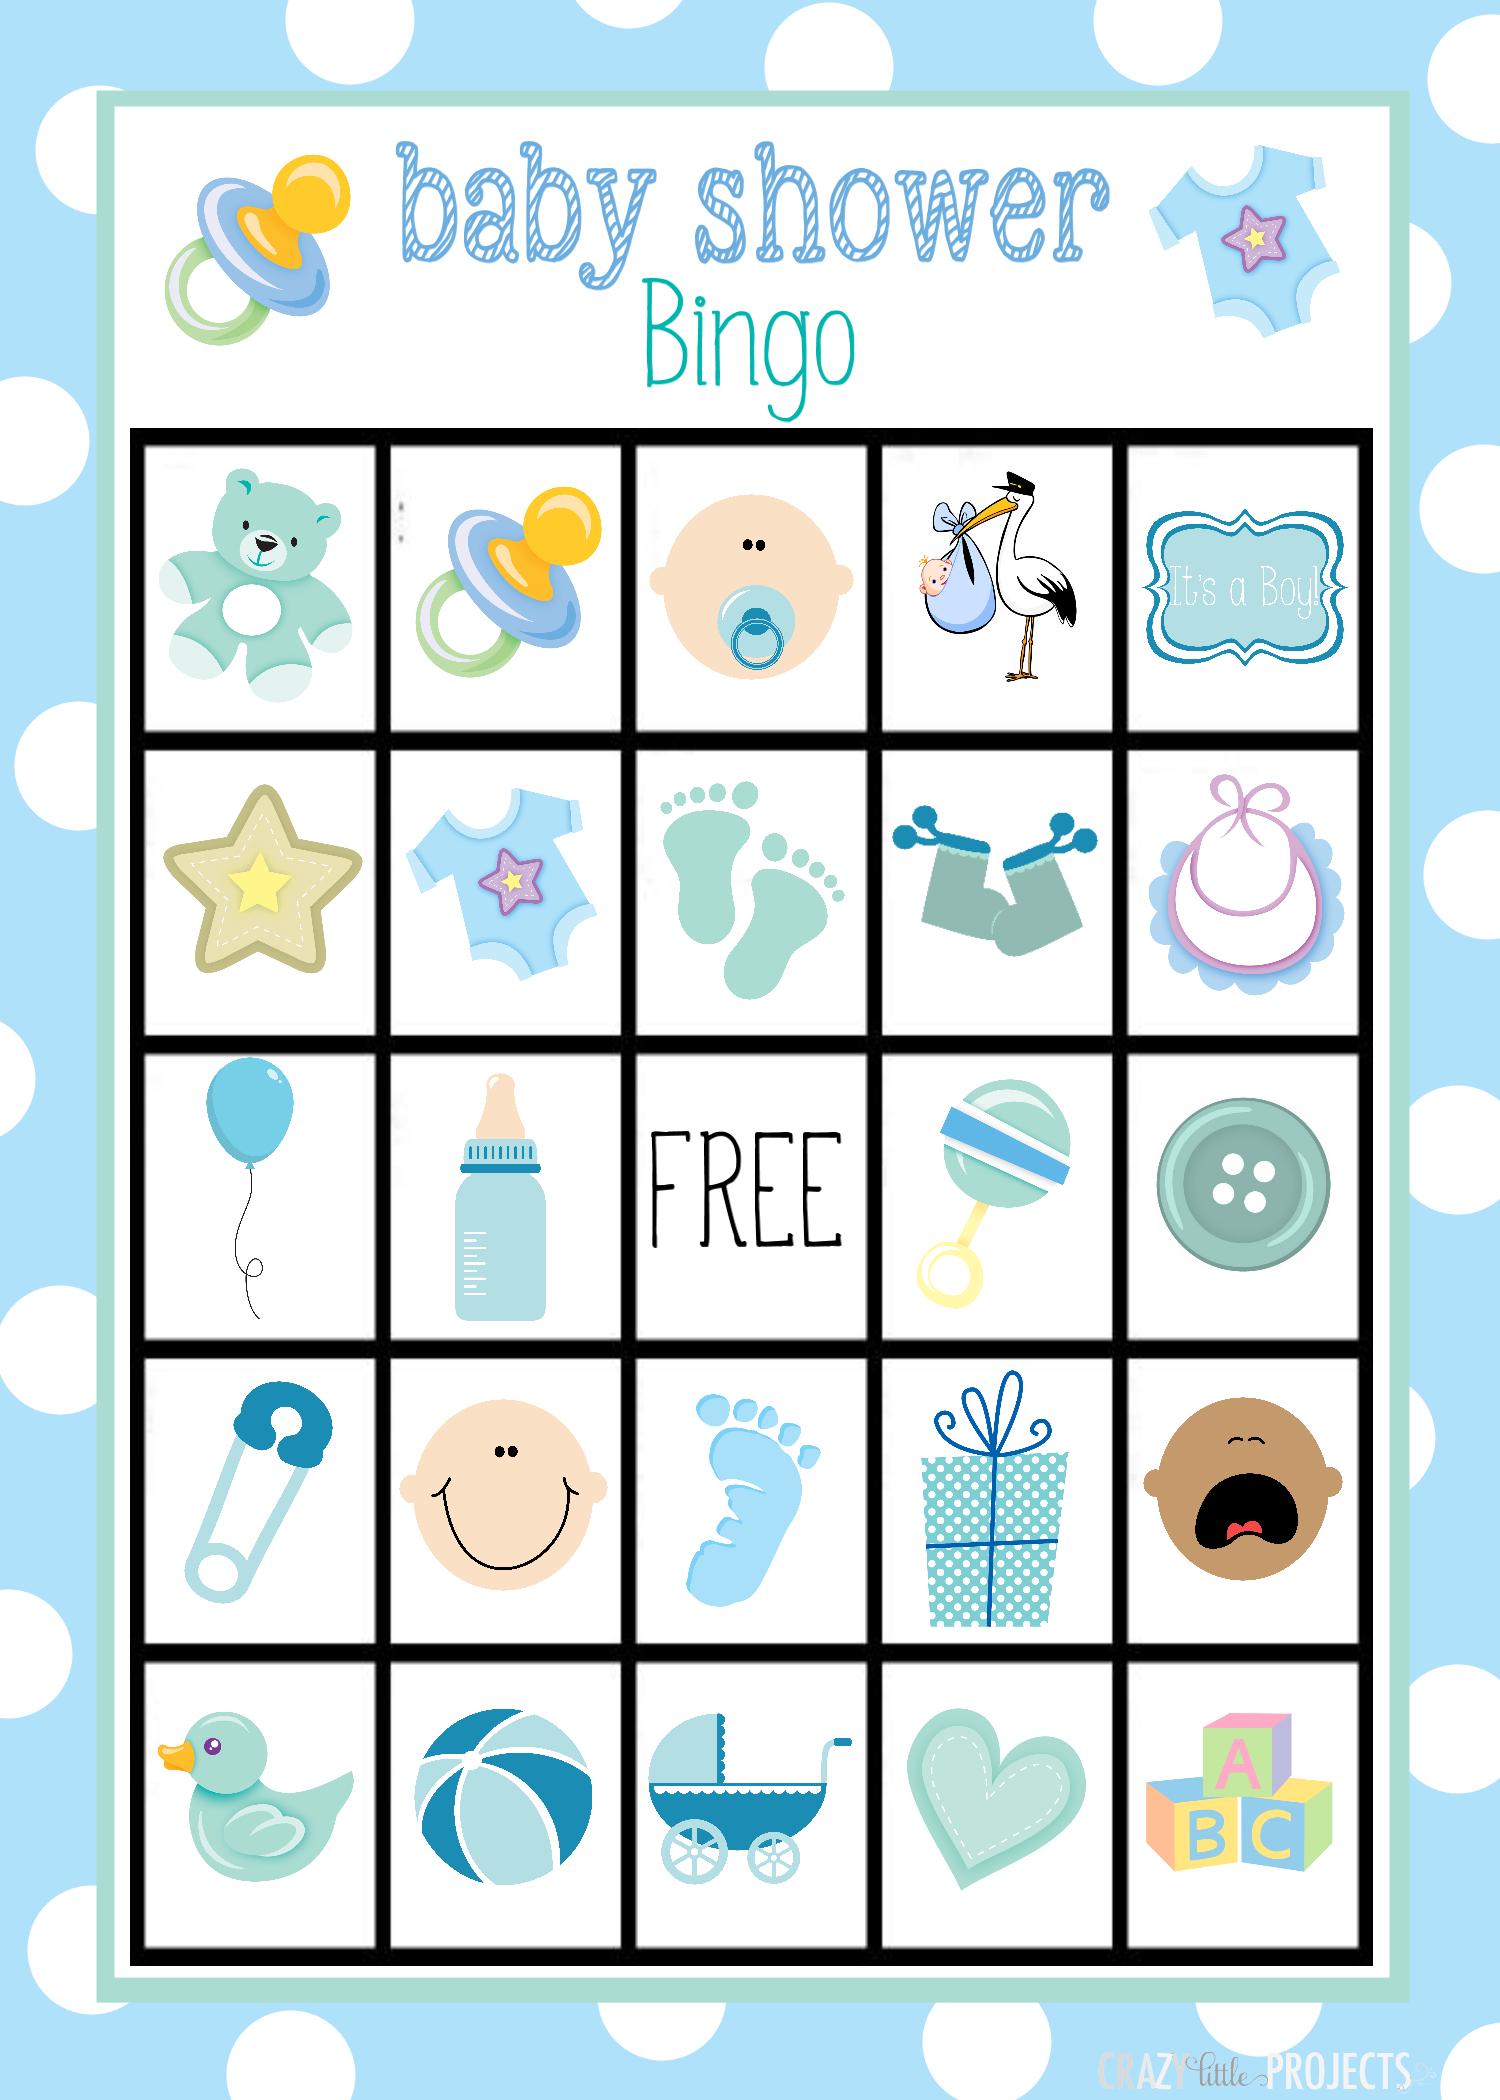 Baby Shower Bingo Cards - Free Printable Baby Shower Bingo Cards Pdf